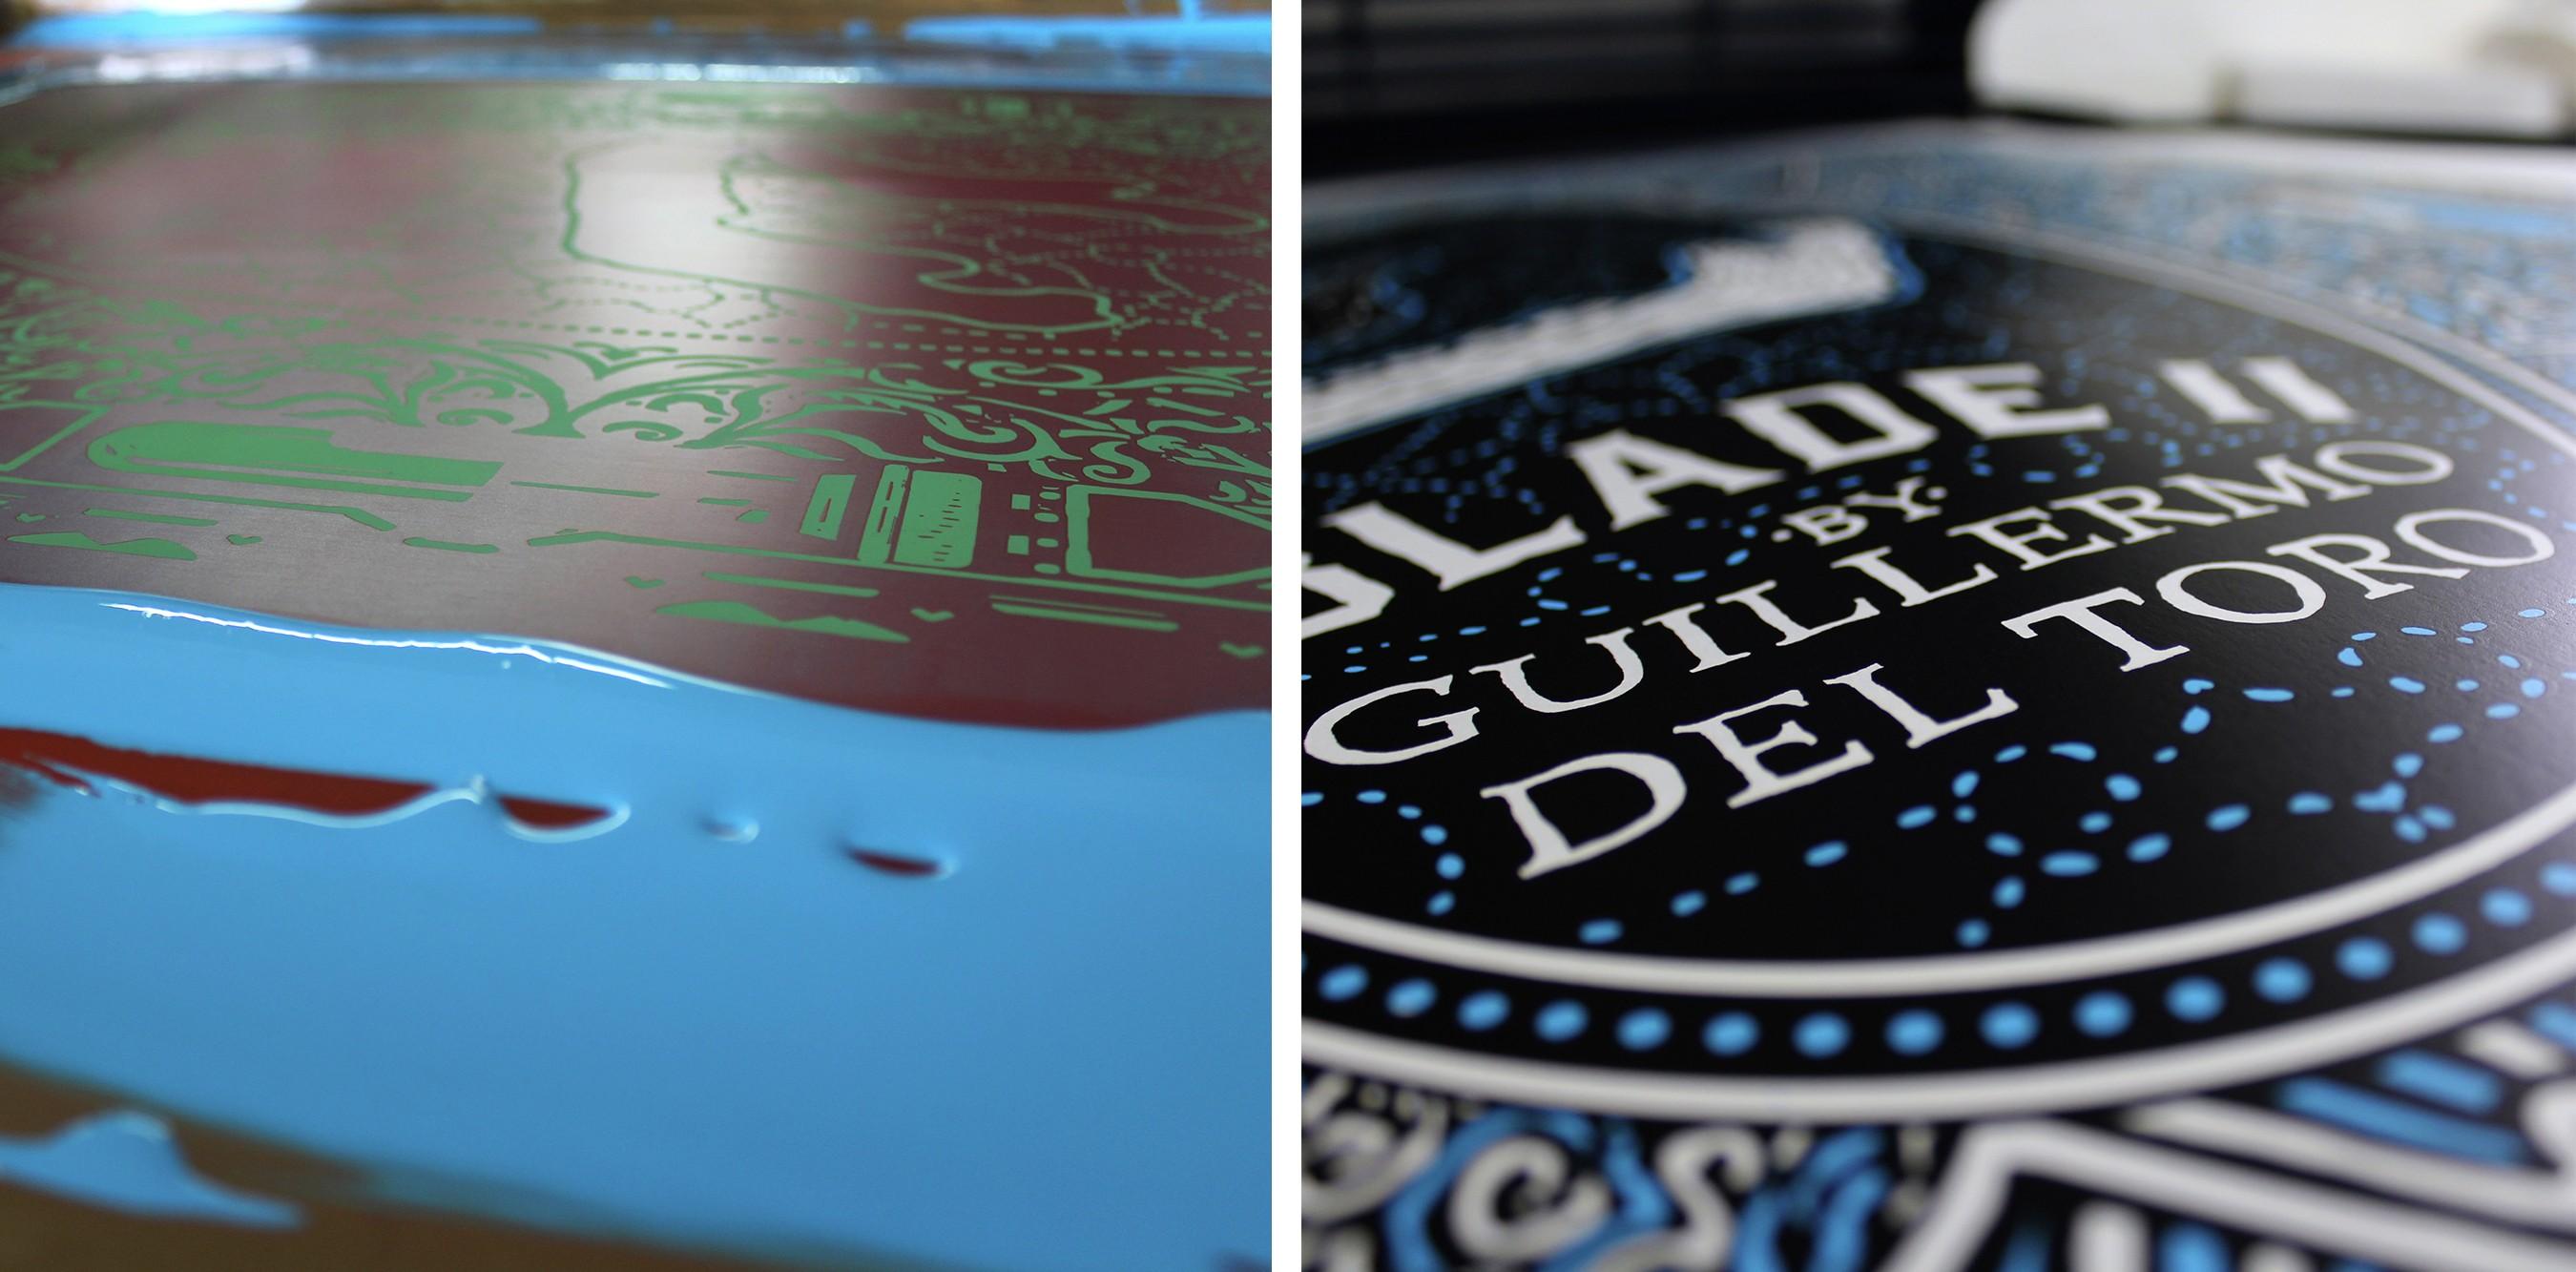 Blade II Screen Print by Pedro Oyarbide